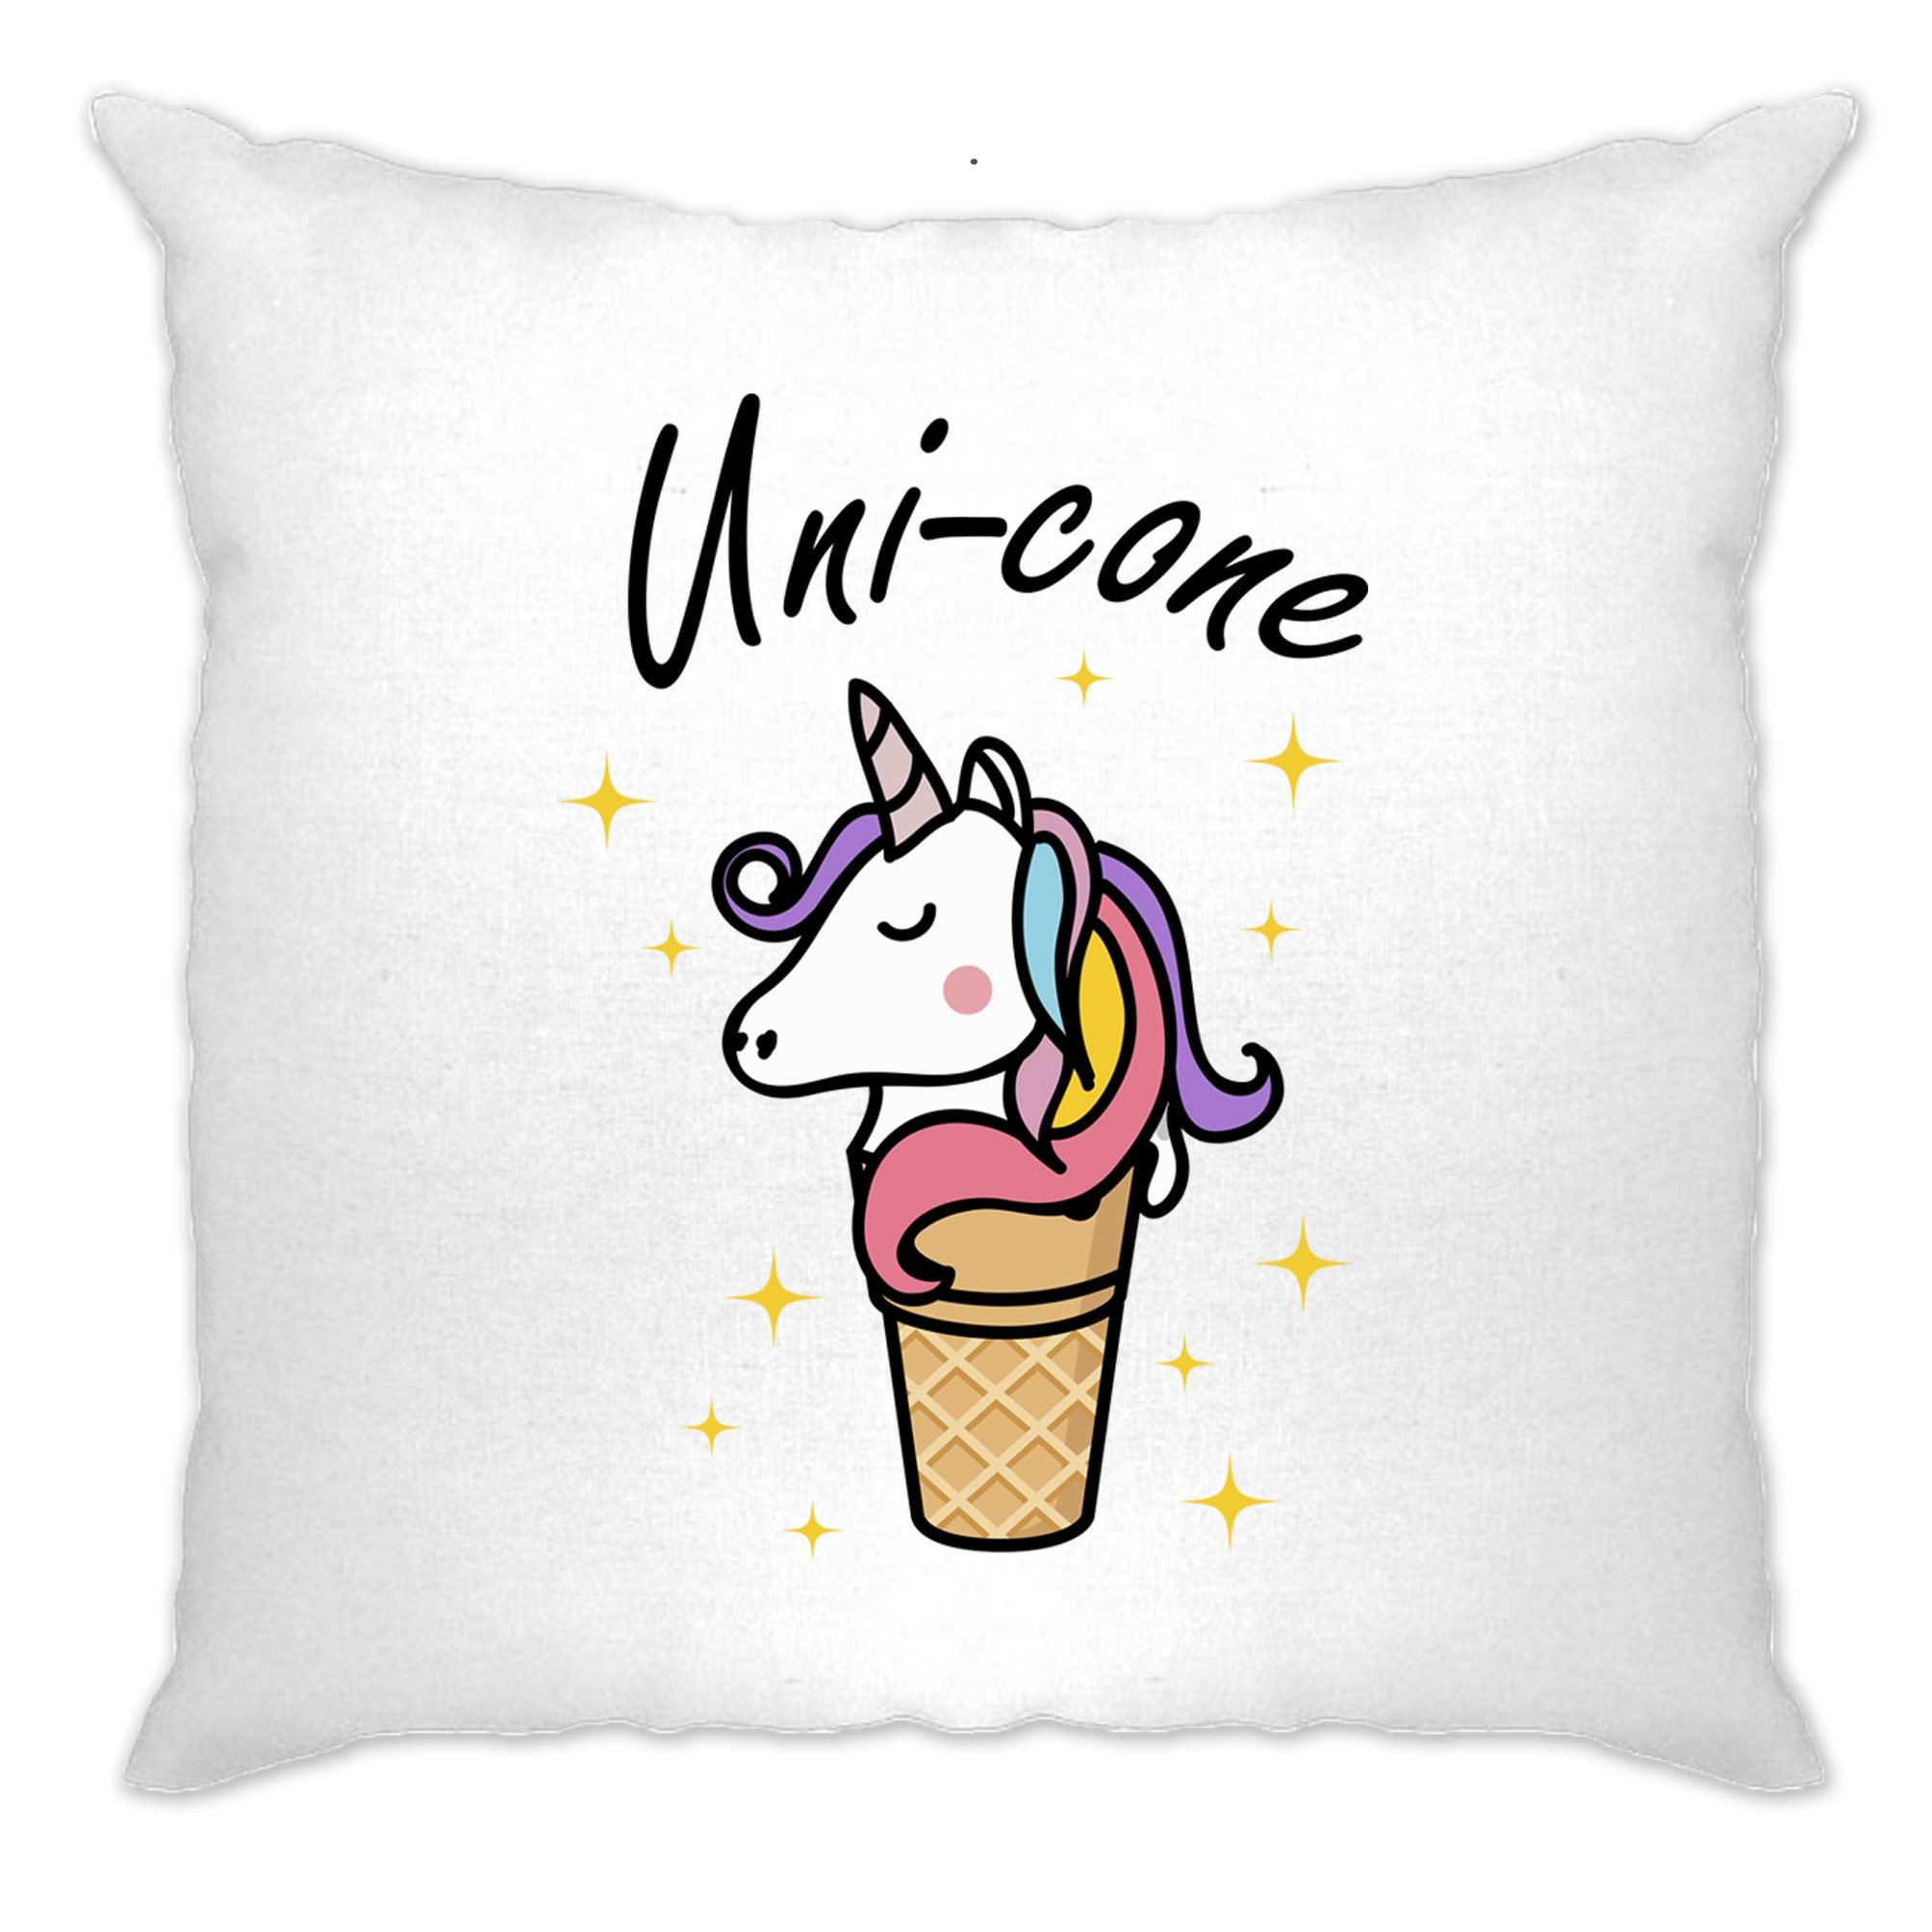 Details about  /Fantasy Joke Mug Uni-Cone Ice Cream Unicorn Pun Mythical Funny Cute Coffee Tea